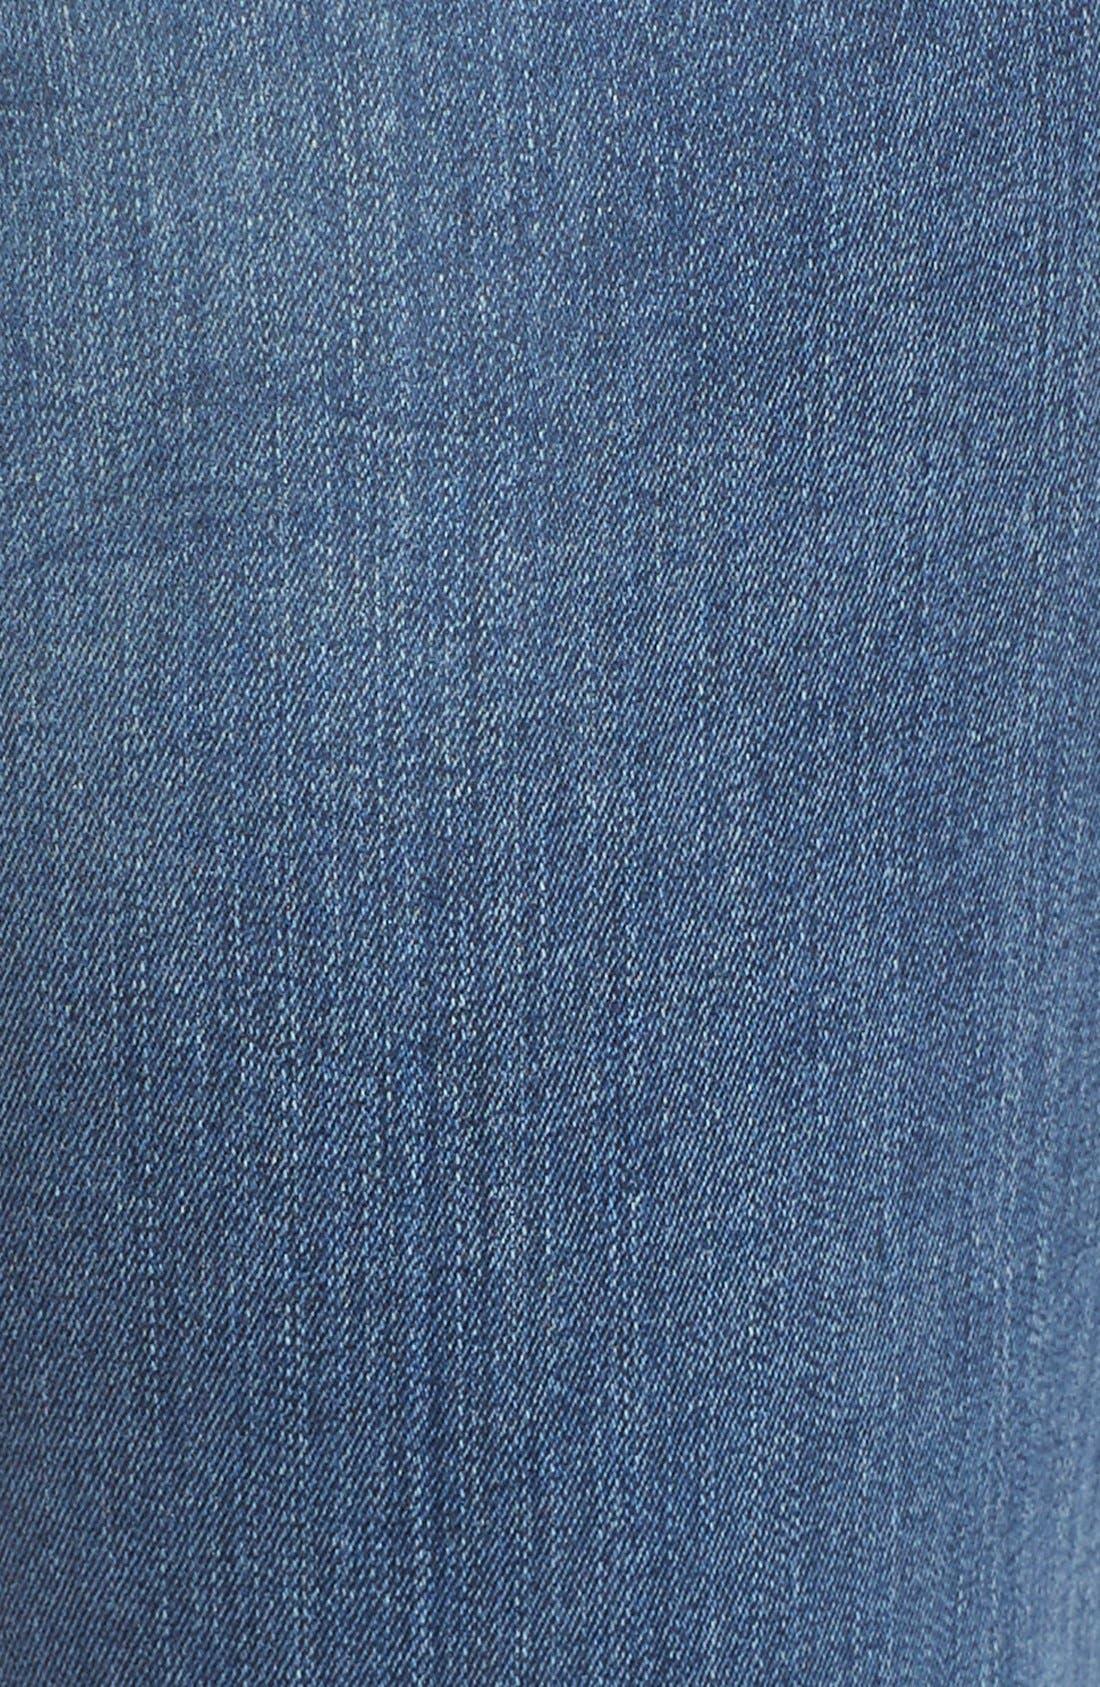 'Samantha' Stretch Slim Straight Leg Jeans,                             Alternate thumbnail 3, color,                             421